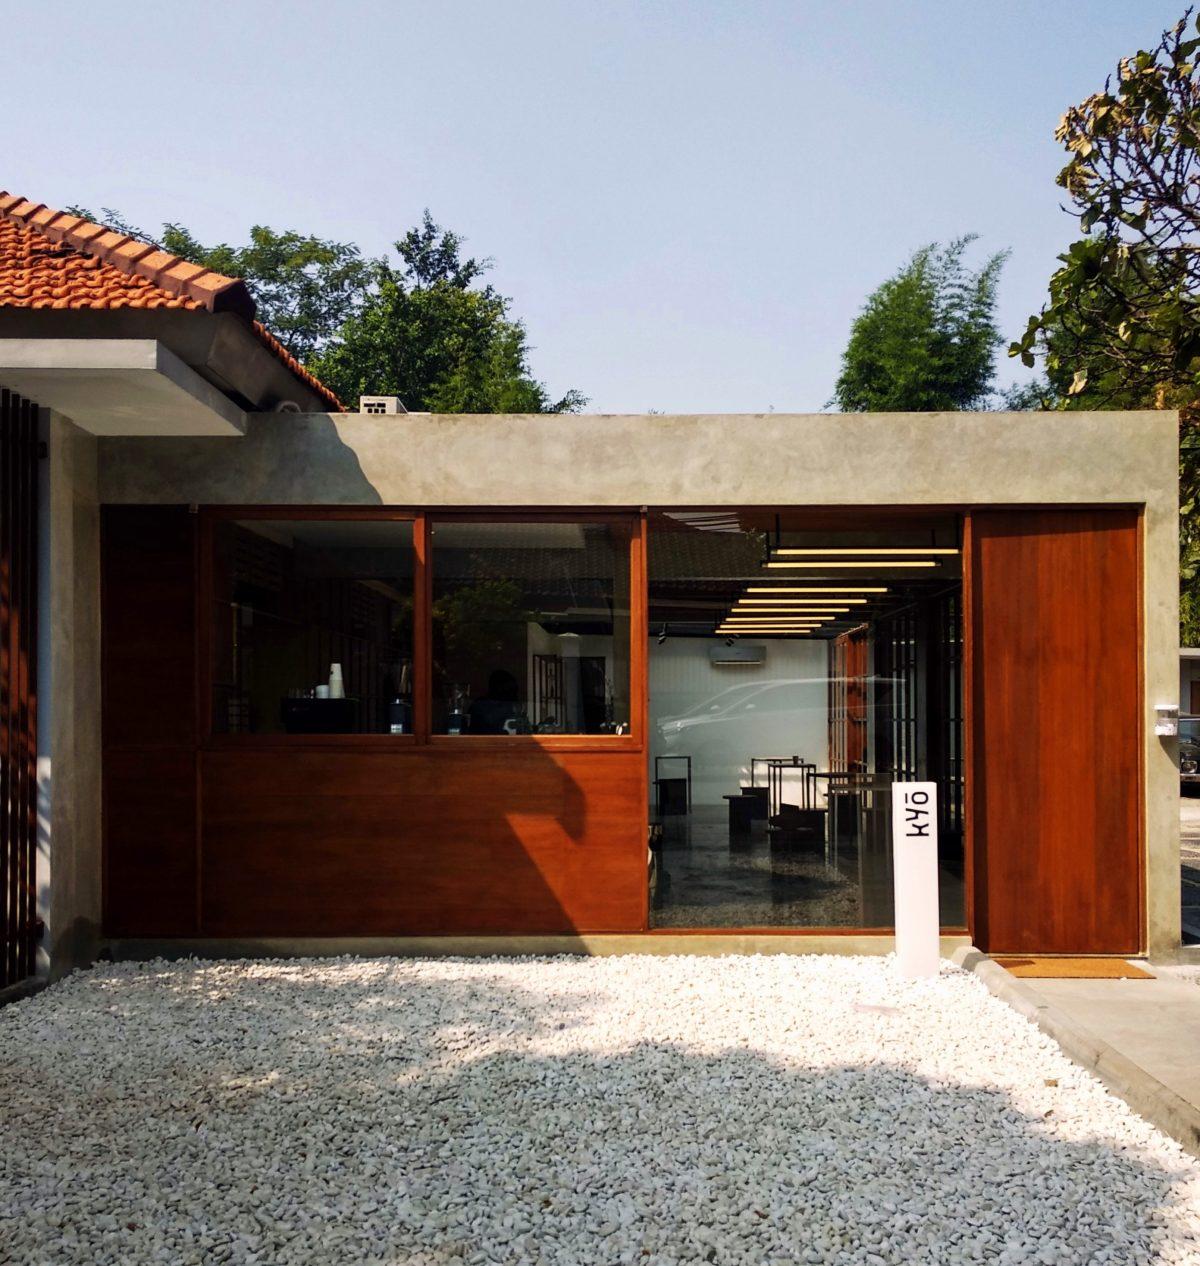 Kyo Coffee, Kedai Kopi Bergaya Jepang di Jatiwaringin